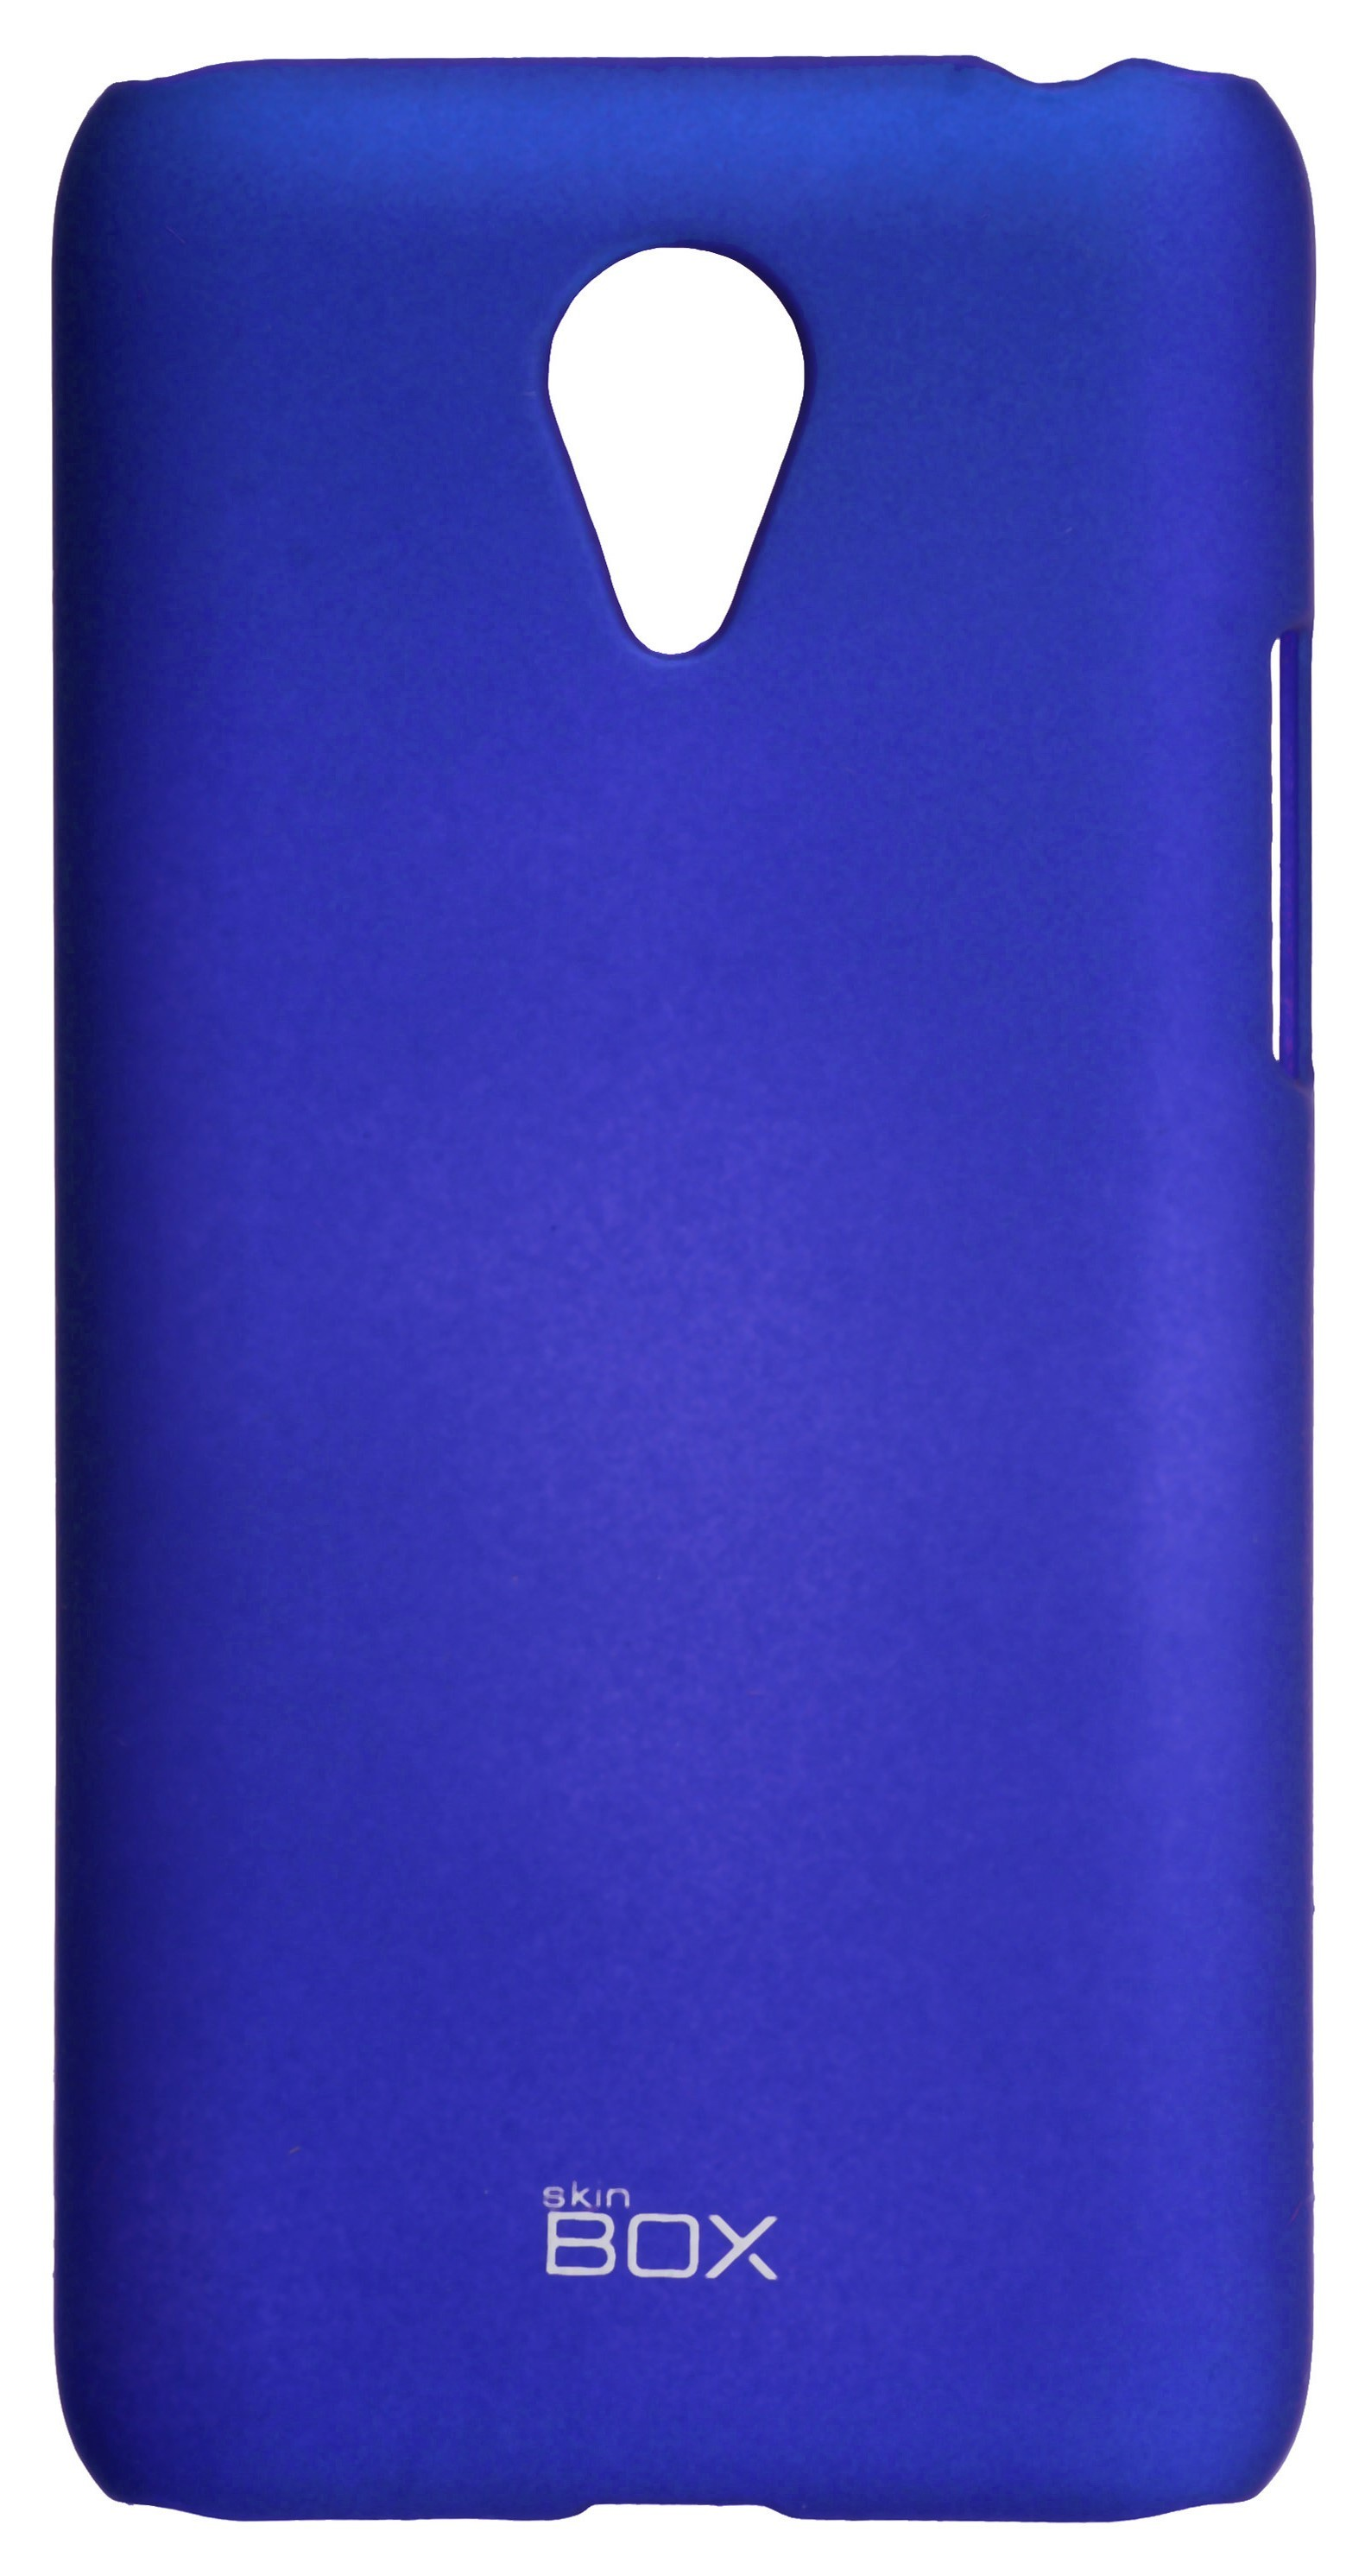 Чехол для сотового телефона skinBOX 4People, 4630042526914, синий все цены